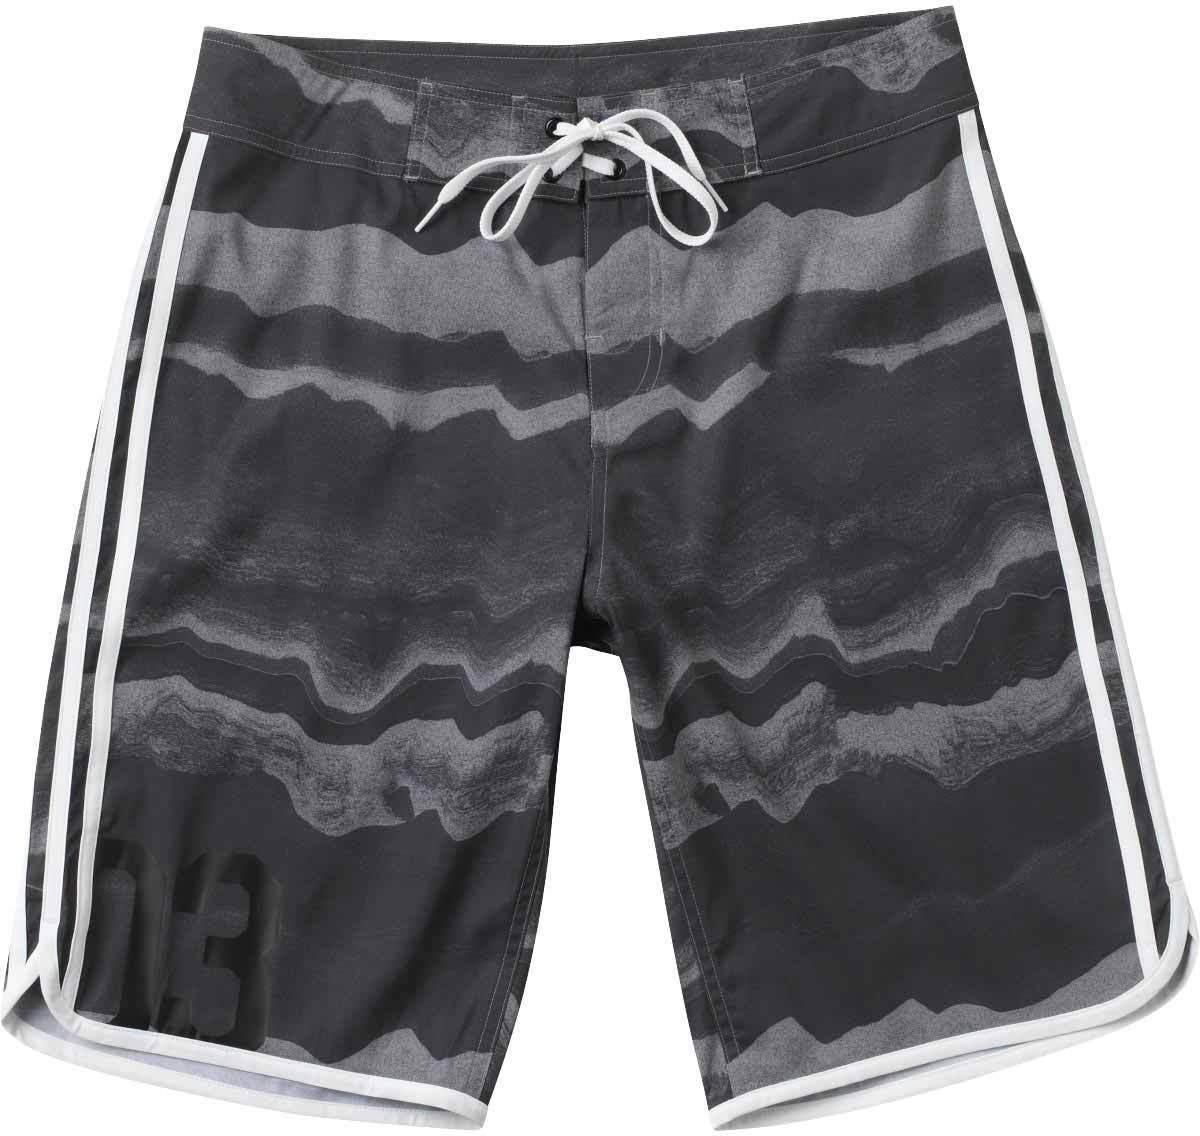 Adidas TONAL HAZE BS Sol Grey All Over Print Swim Trunks Men's Boardshorts